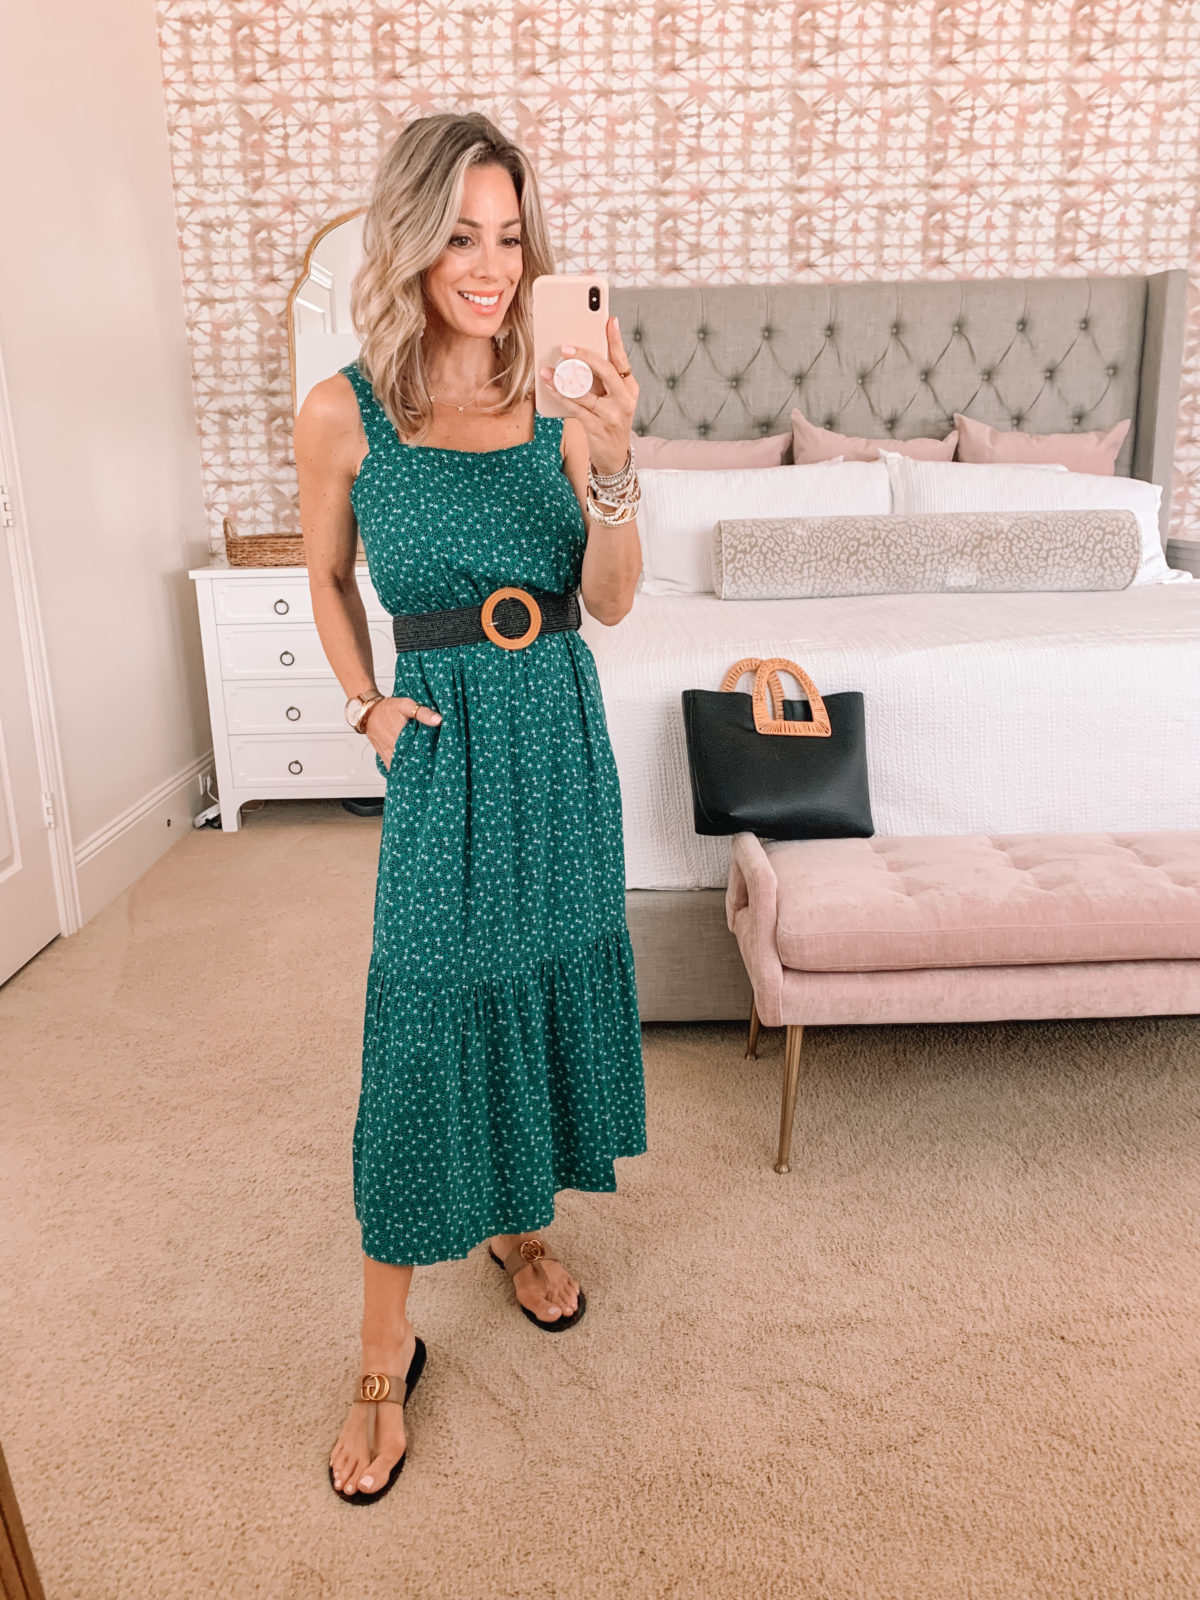 Amazon Fashion Faves, Green Maxi Dress, Sandals, Woven Belt, Tote